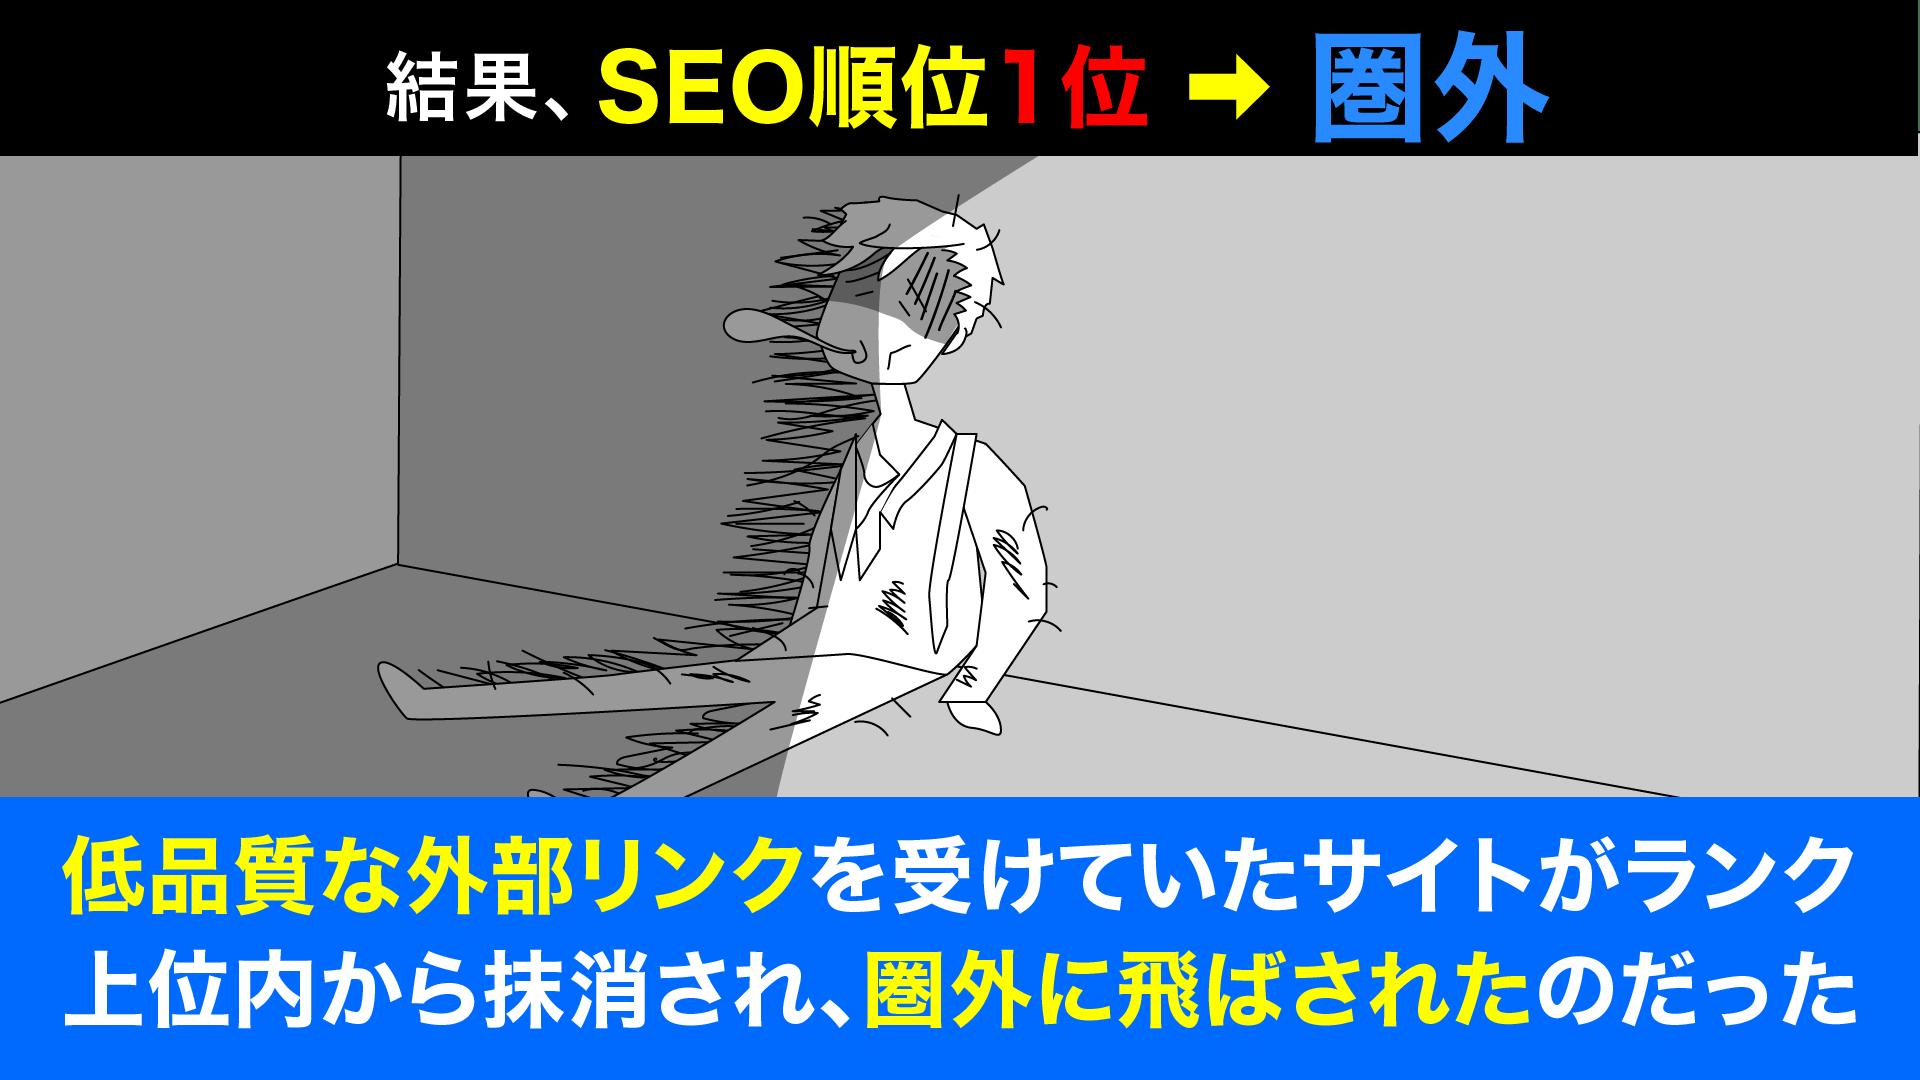 SEO本当にあった事件簿4④